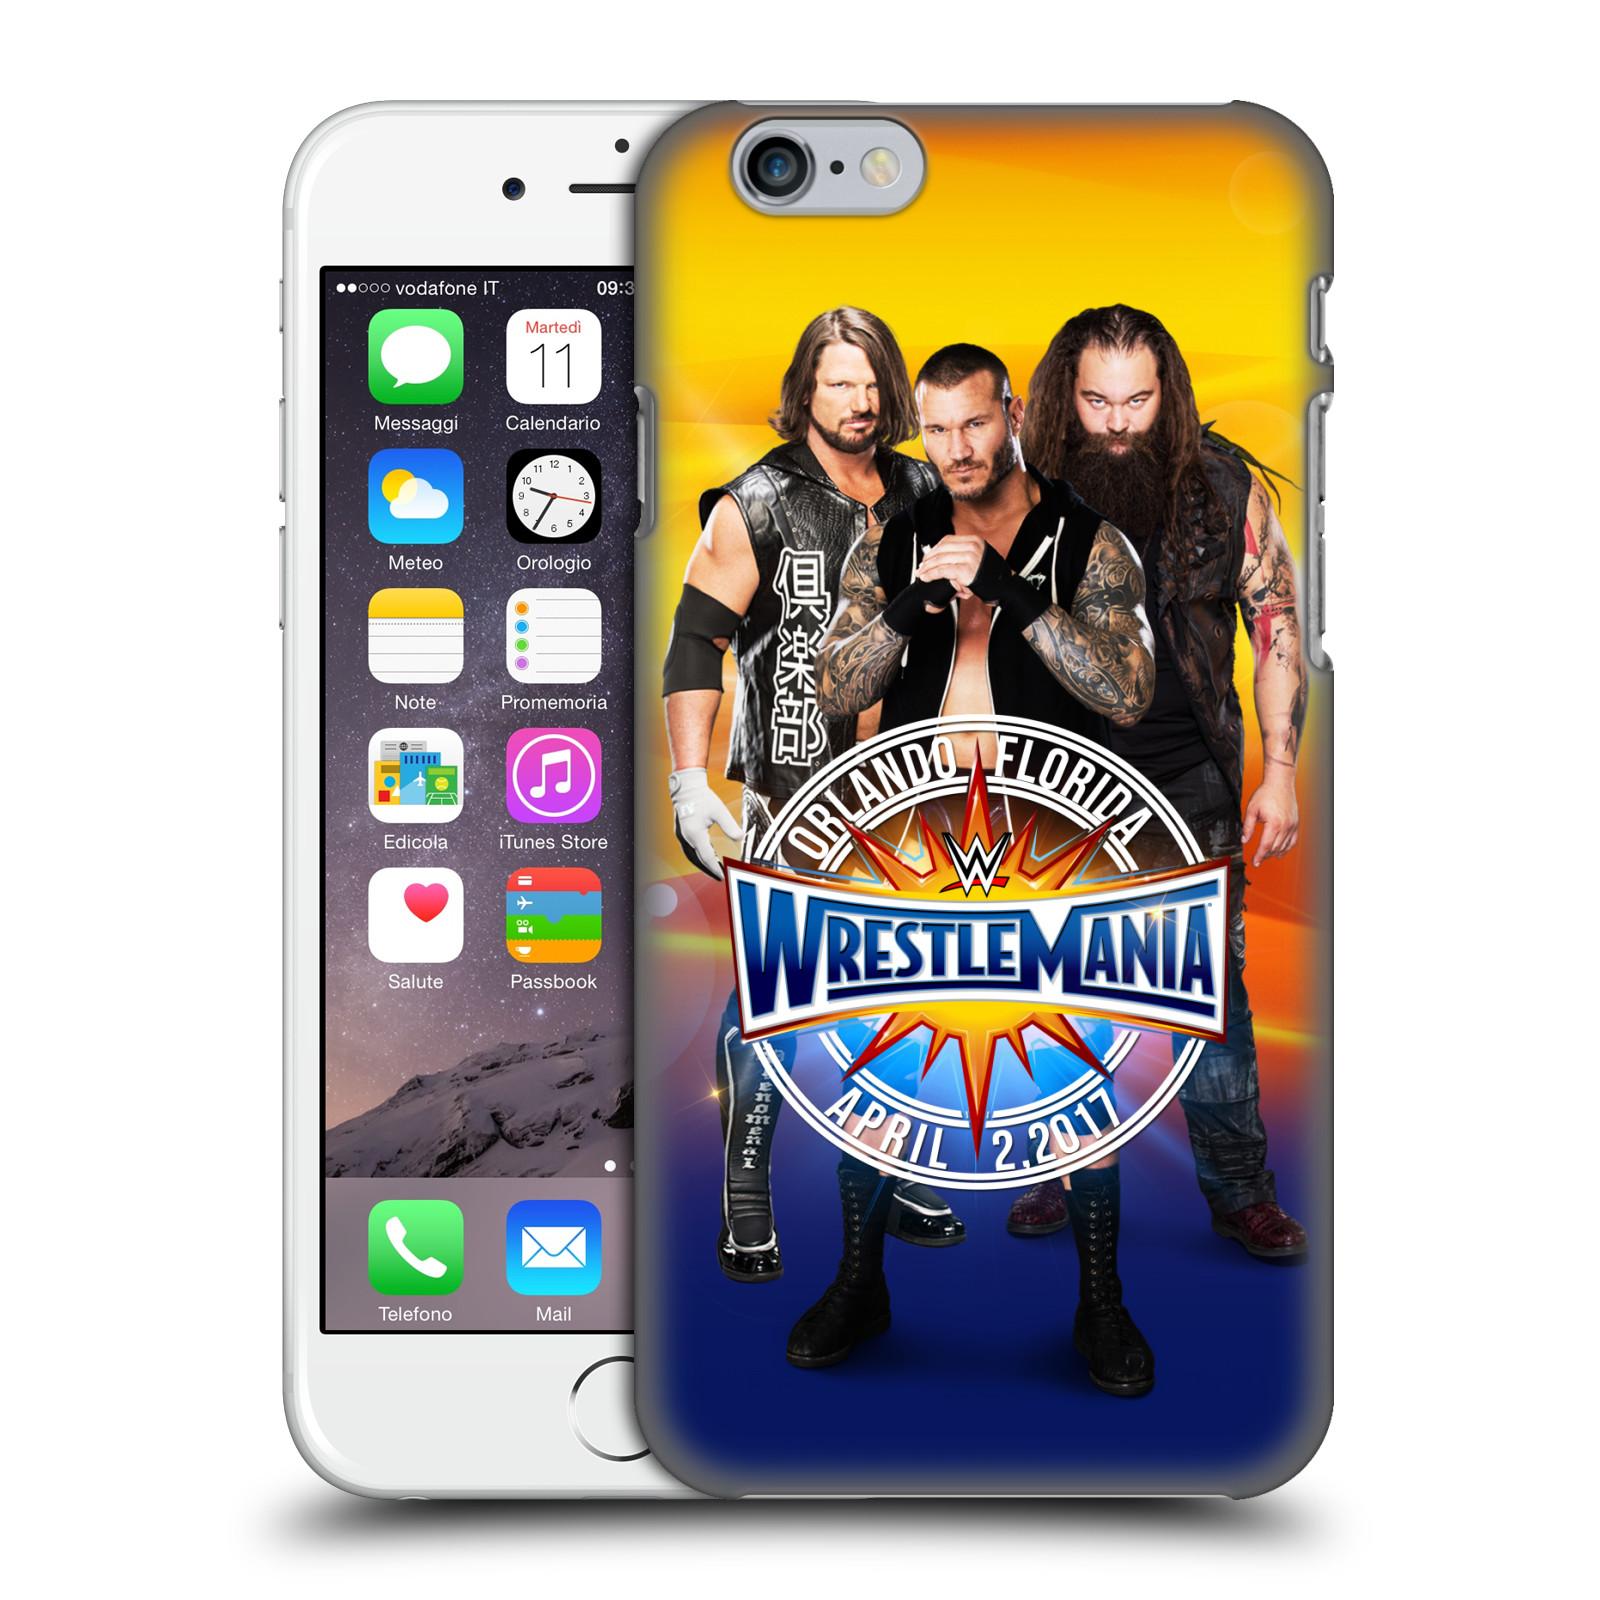 OFFICIAL-WWE-WRESTLEMANIA-33-SUPERSTARS-HARD-BACK-CASE-FOR-APPLE-iPHONE-PHONES